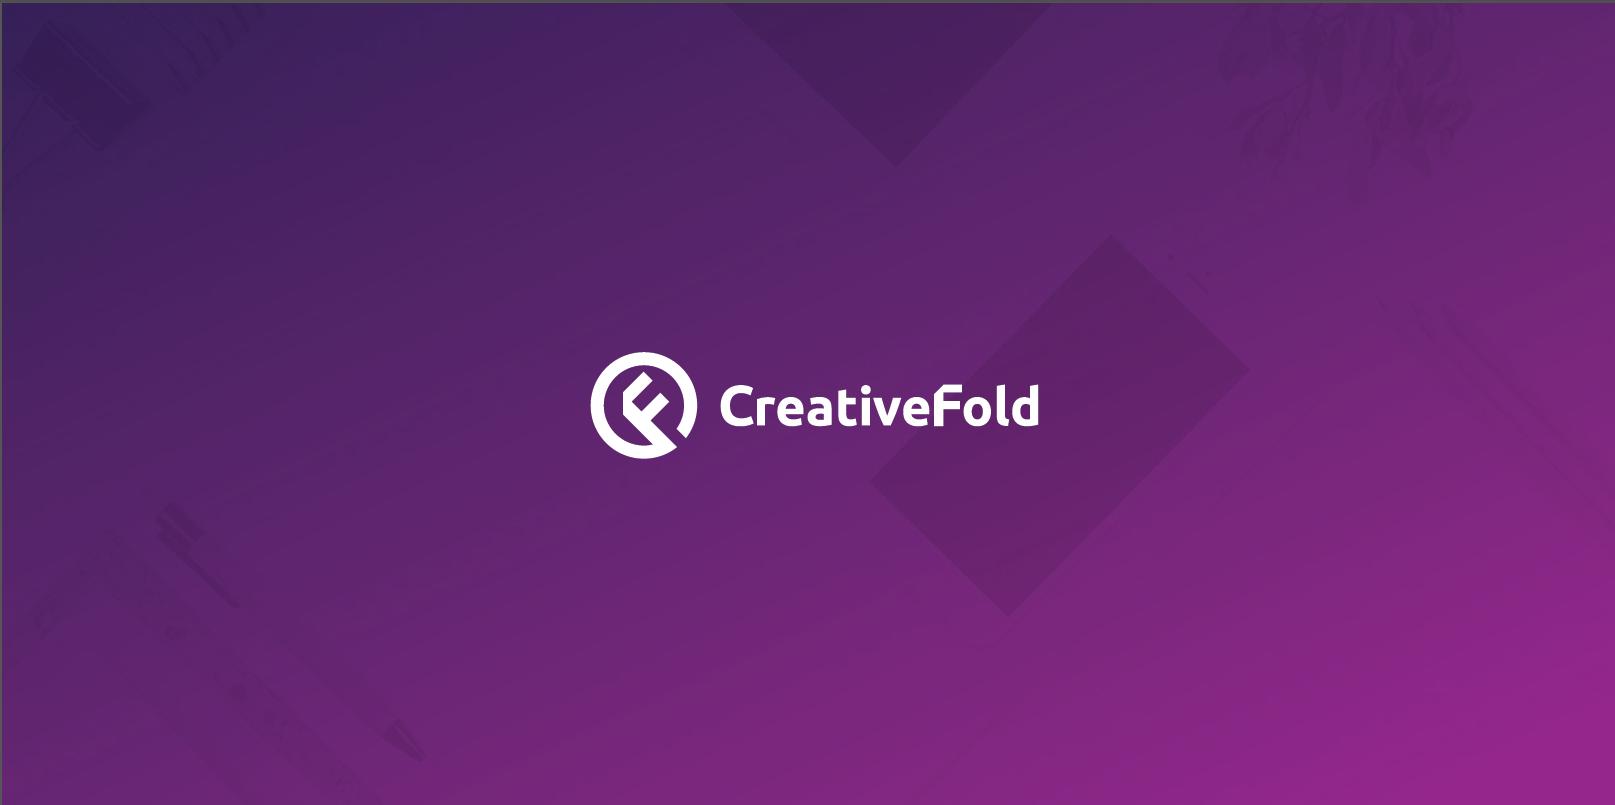 Creativefold Logo (1).png